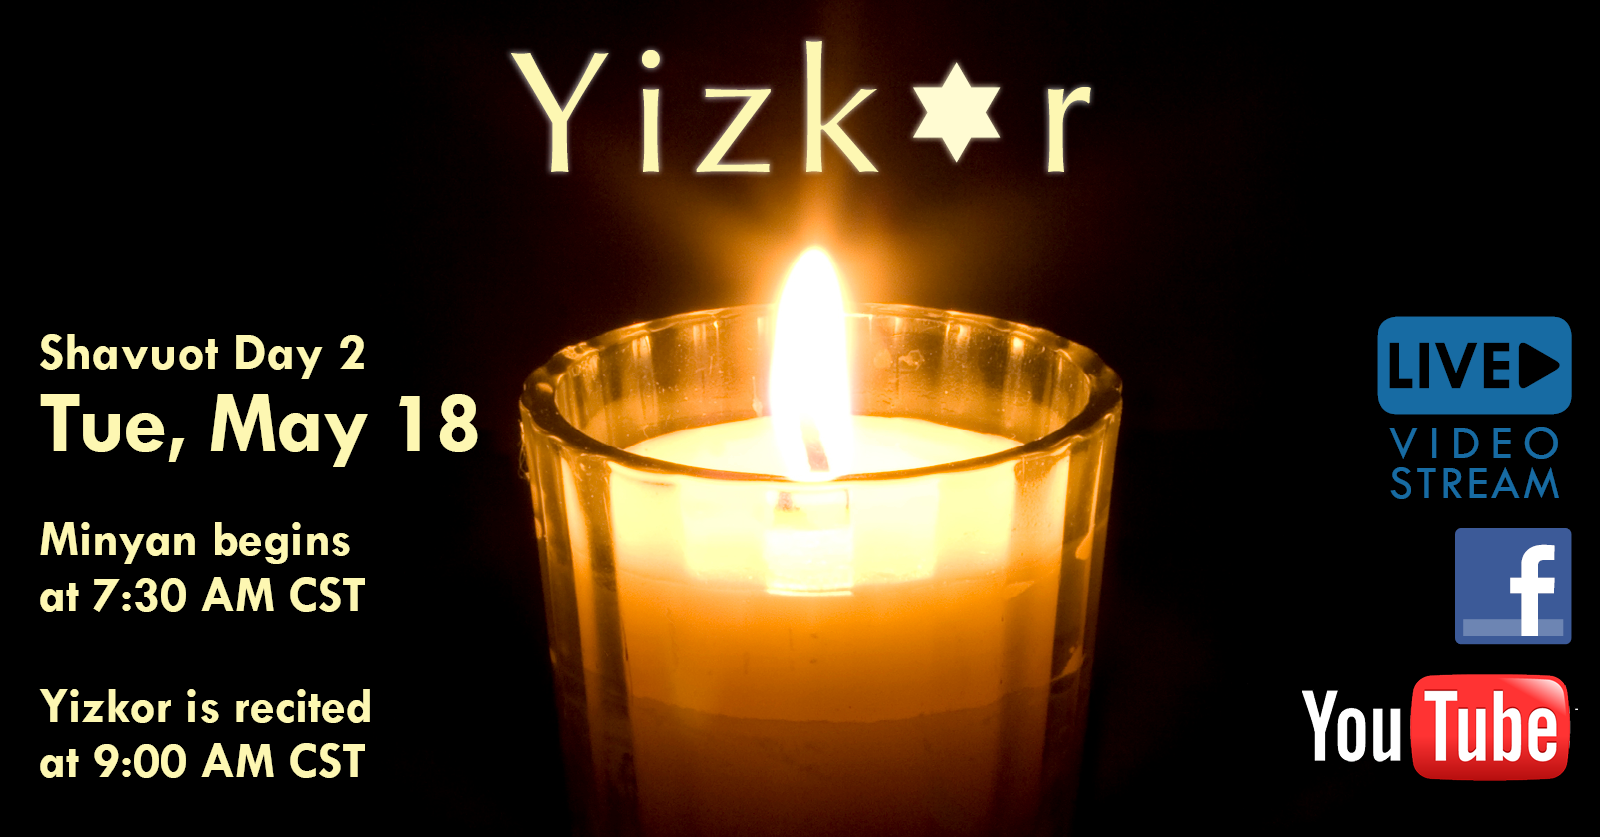 Banner Image for Yizkor (Minyan 7:30 AM, Yizkor 9:00 AM CST)